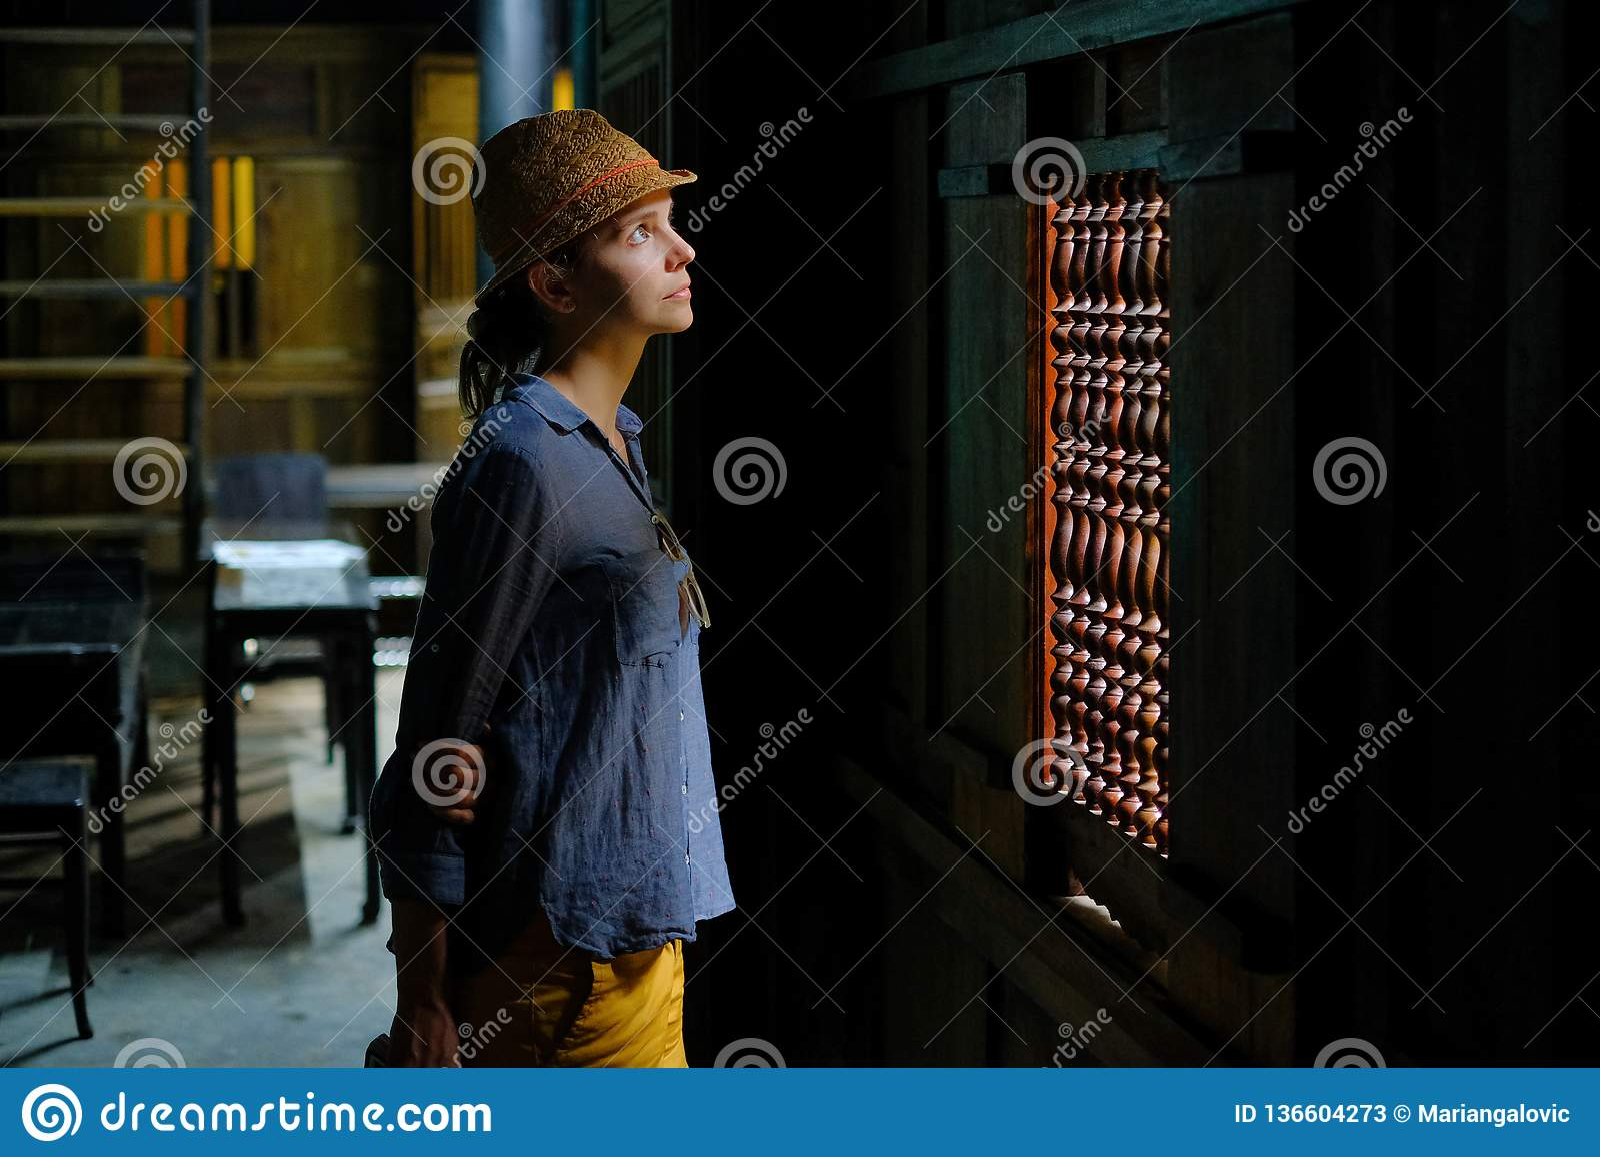 Hoi An/Vietnam, 11/11/2017: Condizione turistica femminile nell interno di legno scuro di una casa tradizionale Tan Ky in Hoi An,